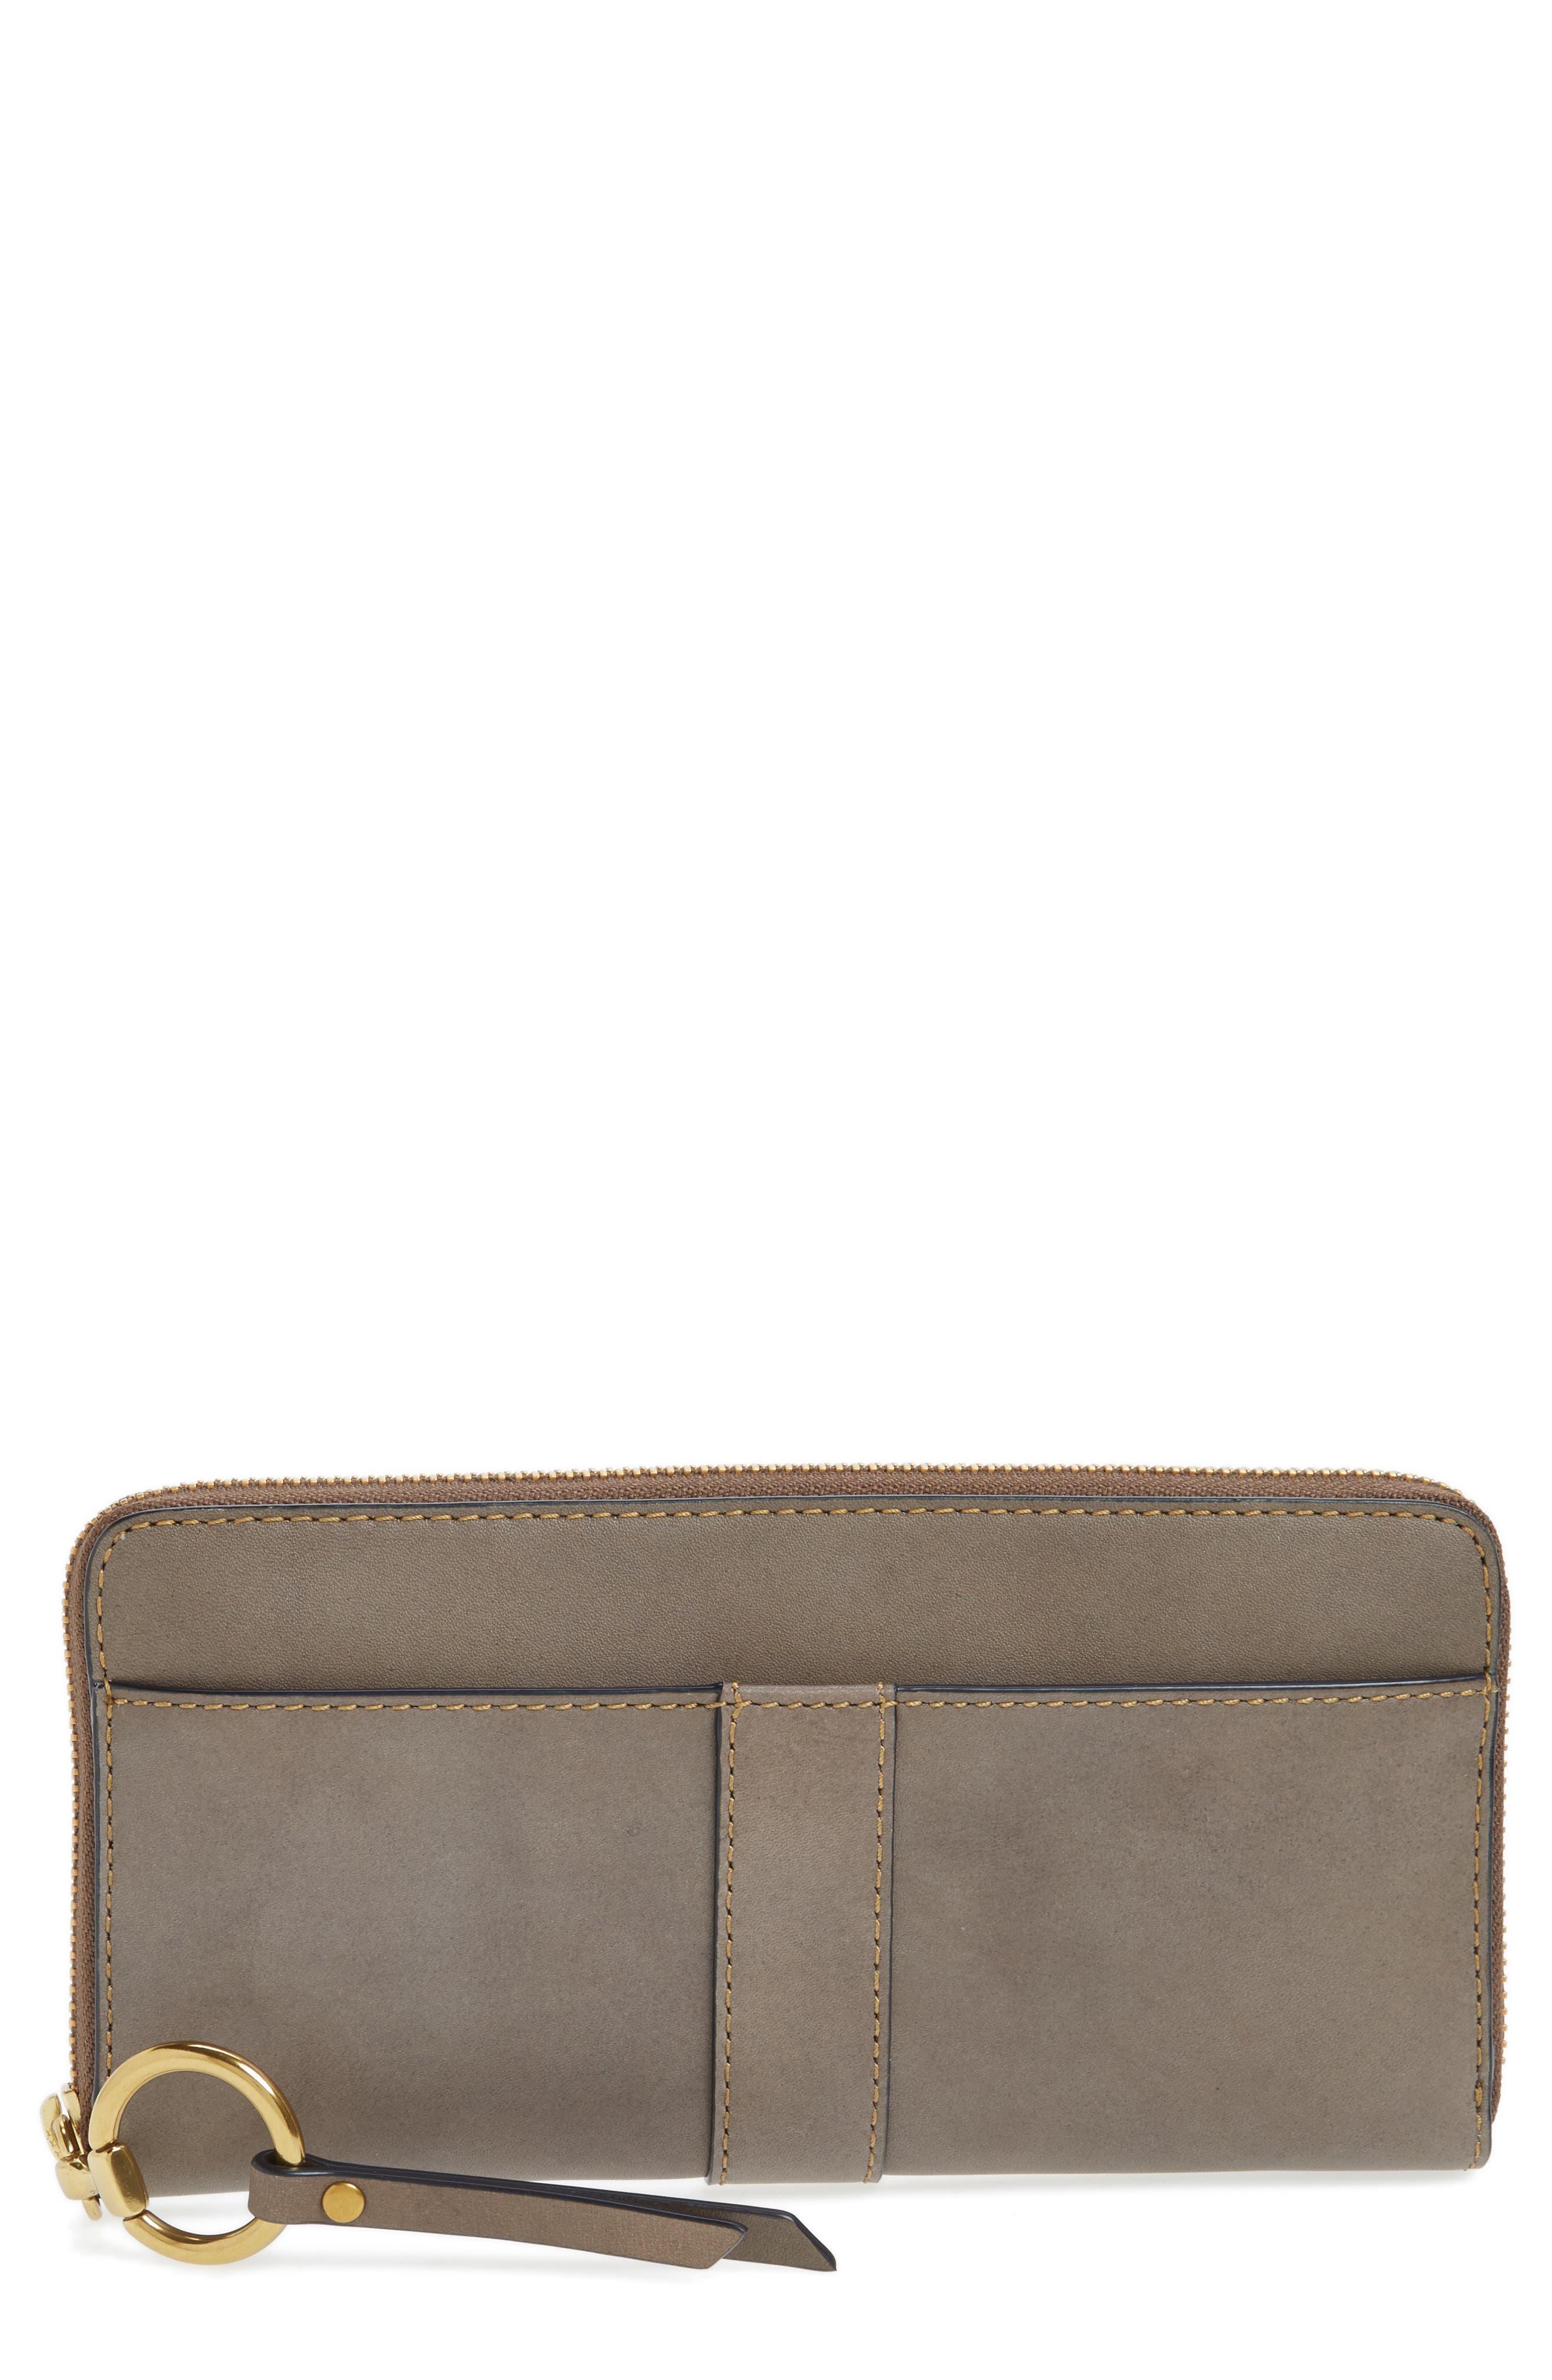 Ilana Harness Leather Zip Wallet,                         Main,                         color, Grey